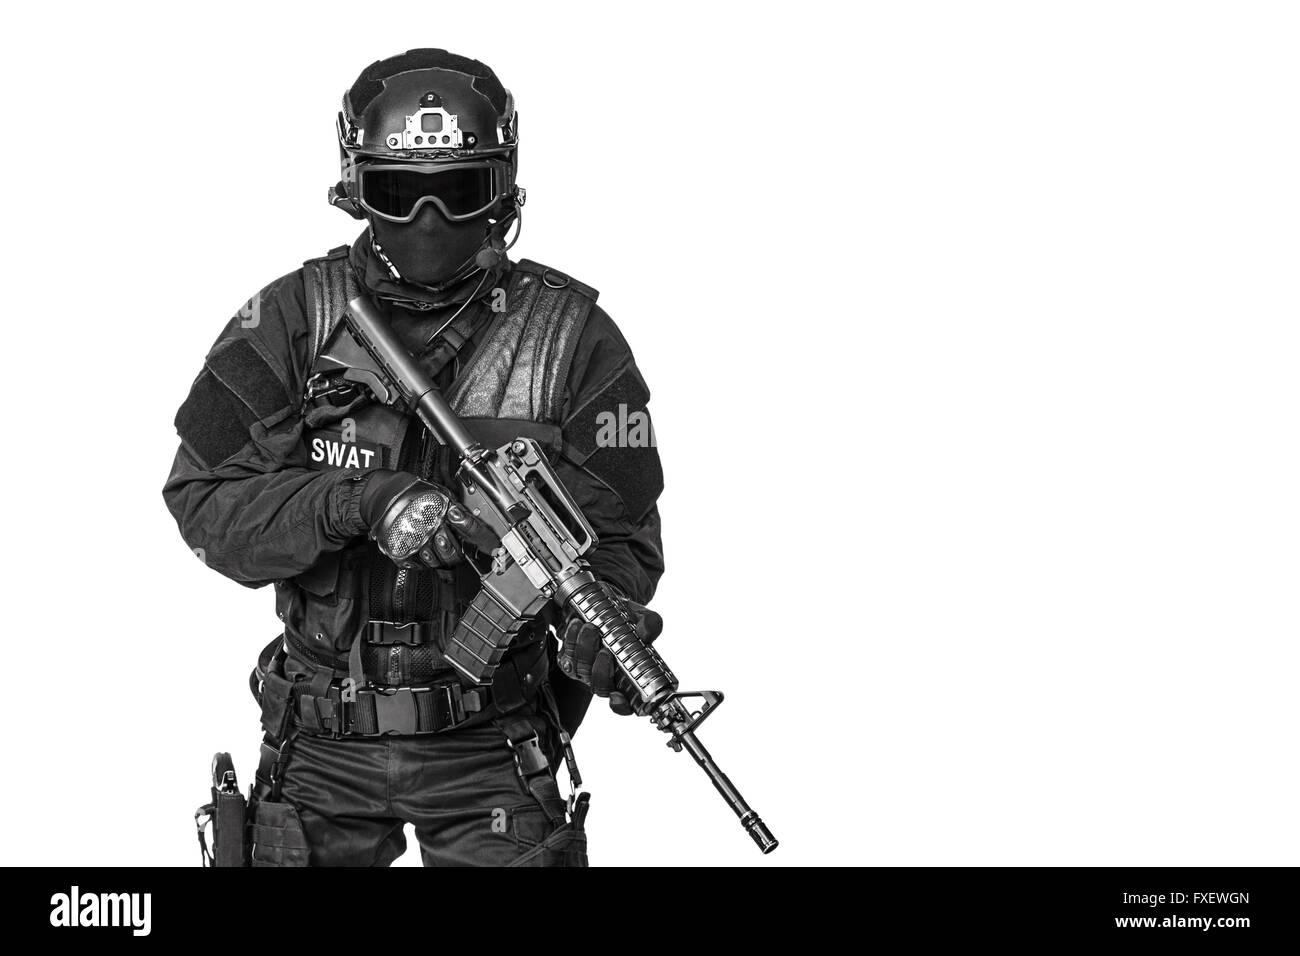 Spec ops police officer SWAT - Stock Image